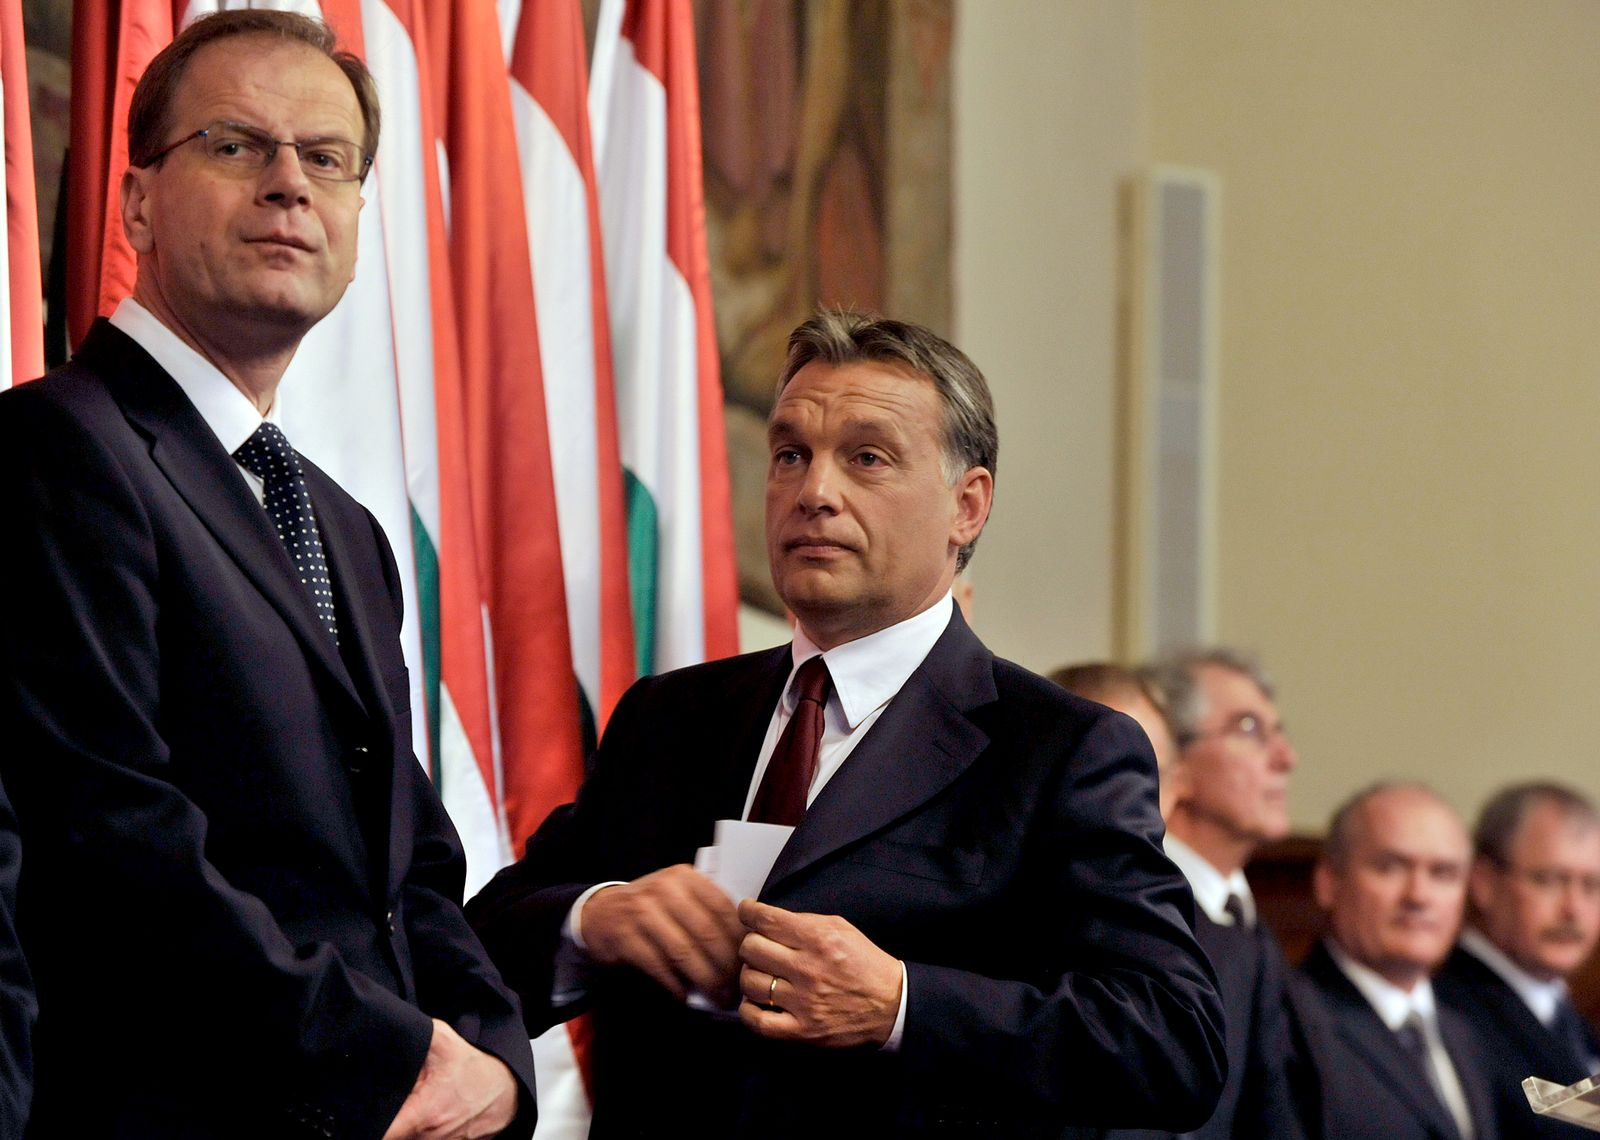 Tibor Navracsics & Viktor Orban